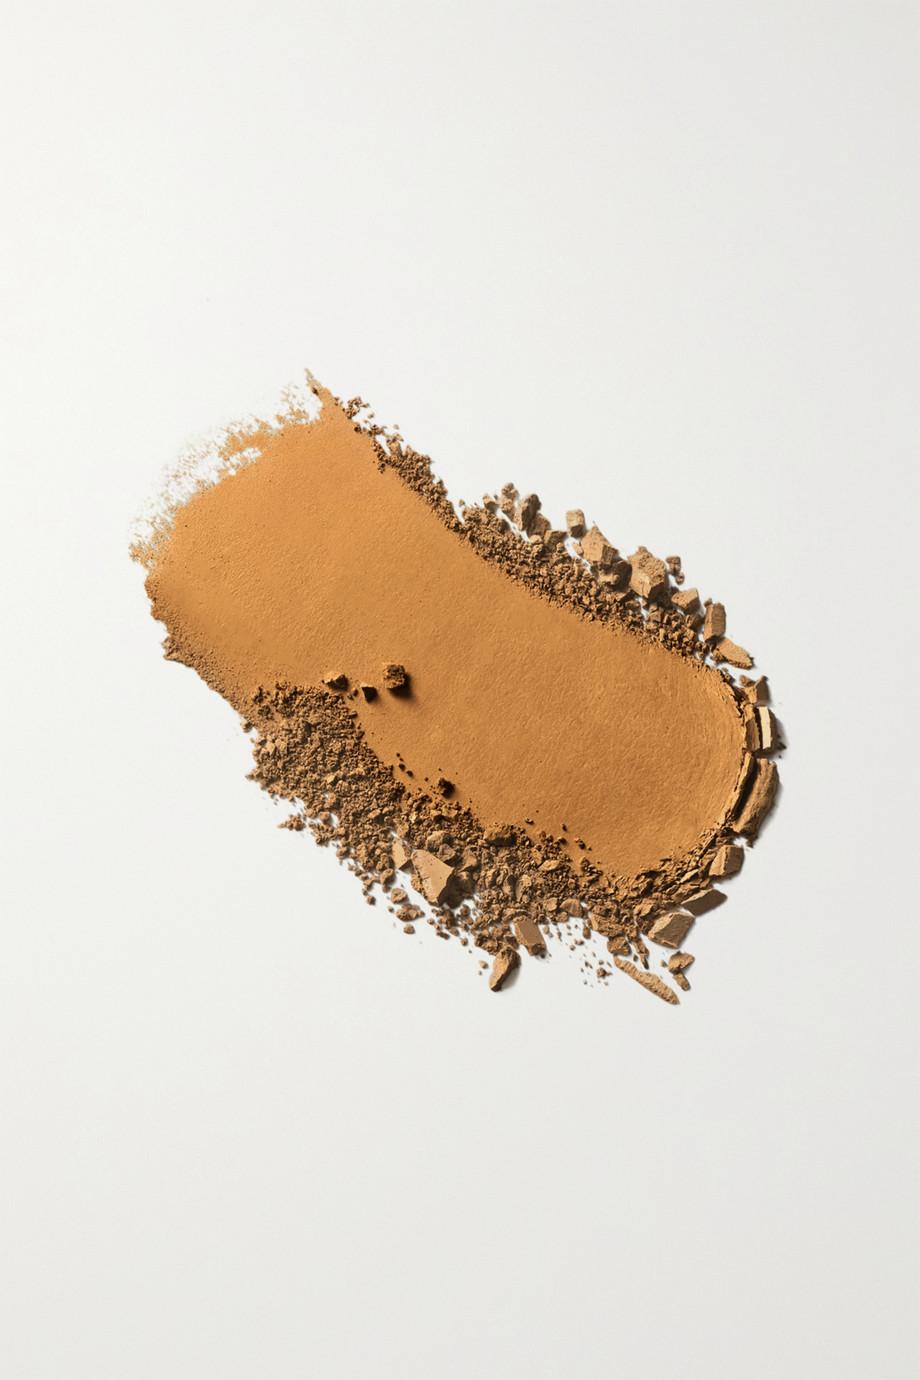 La Mer The Soft Moisture Powder Foundation SPF 30 Refill - Caramel